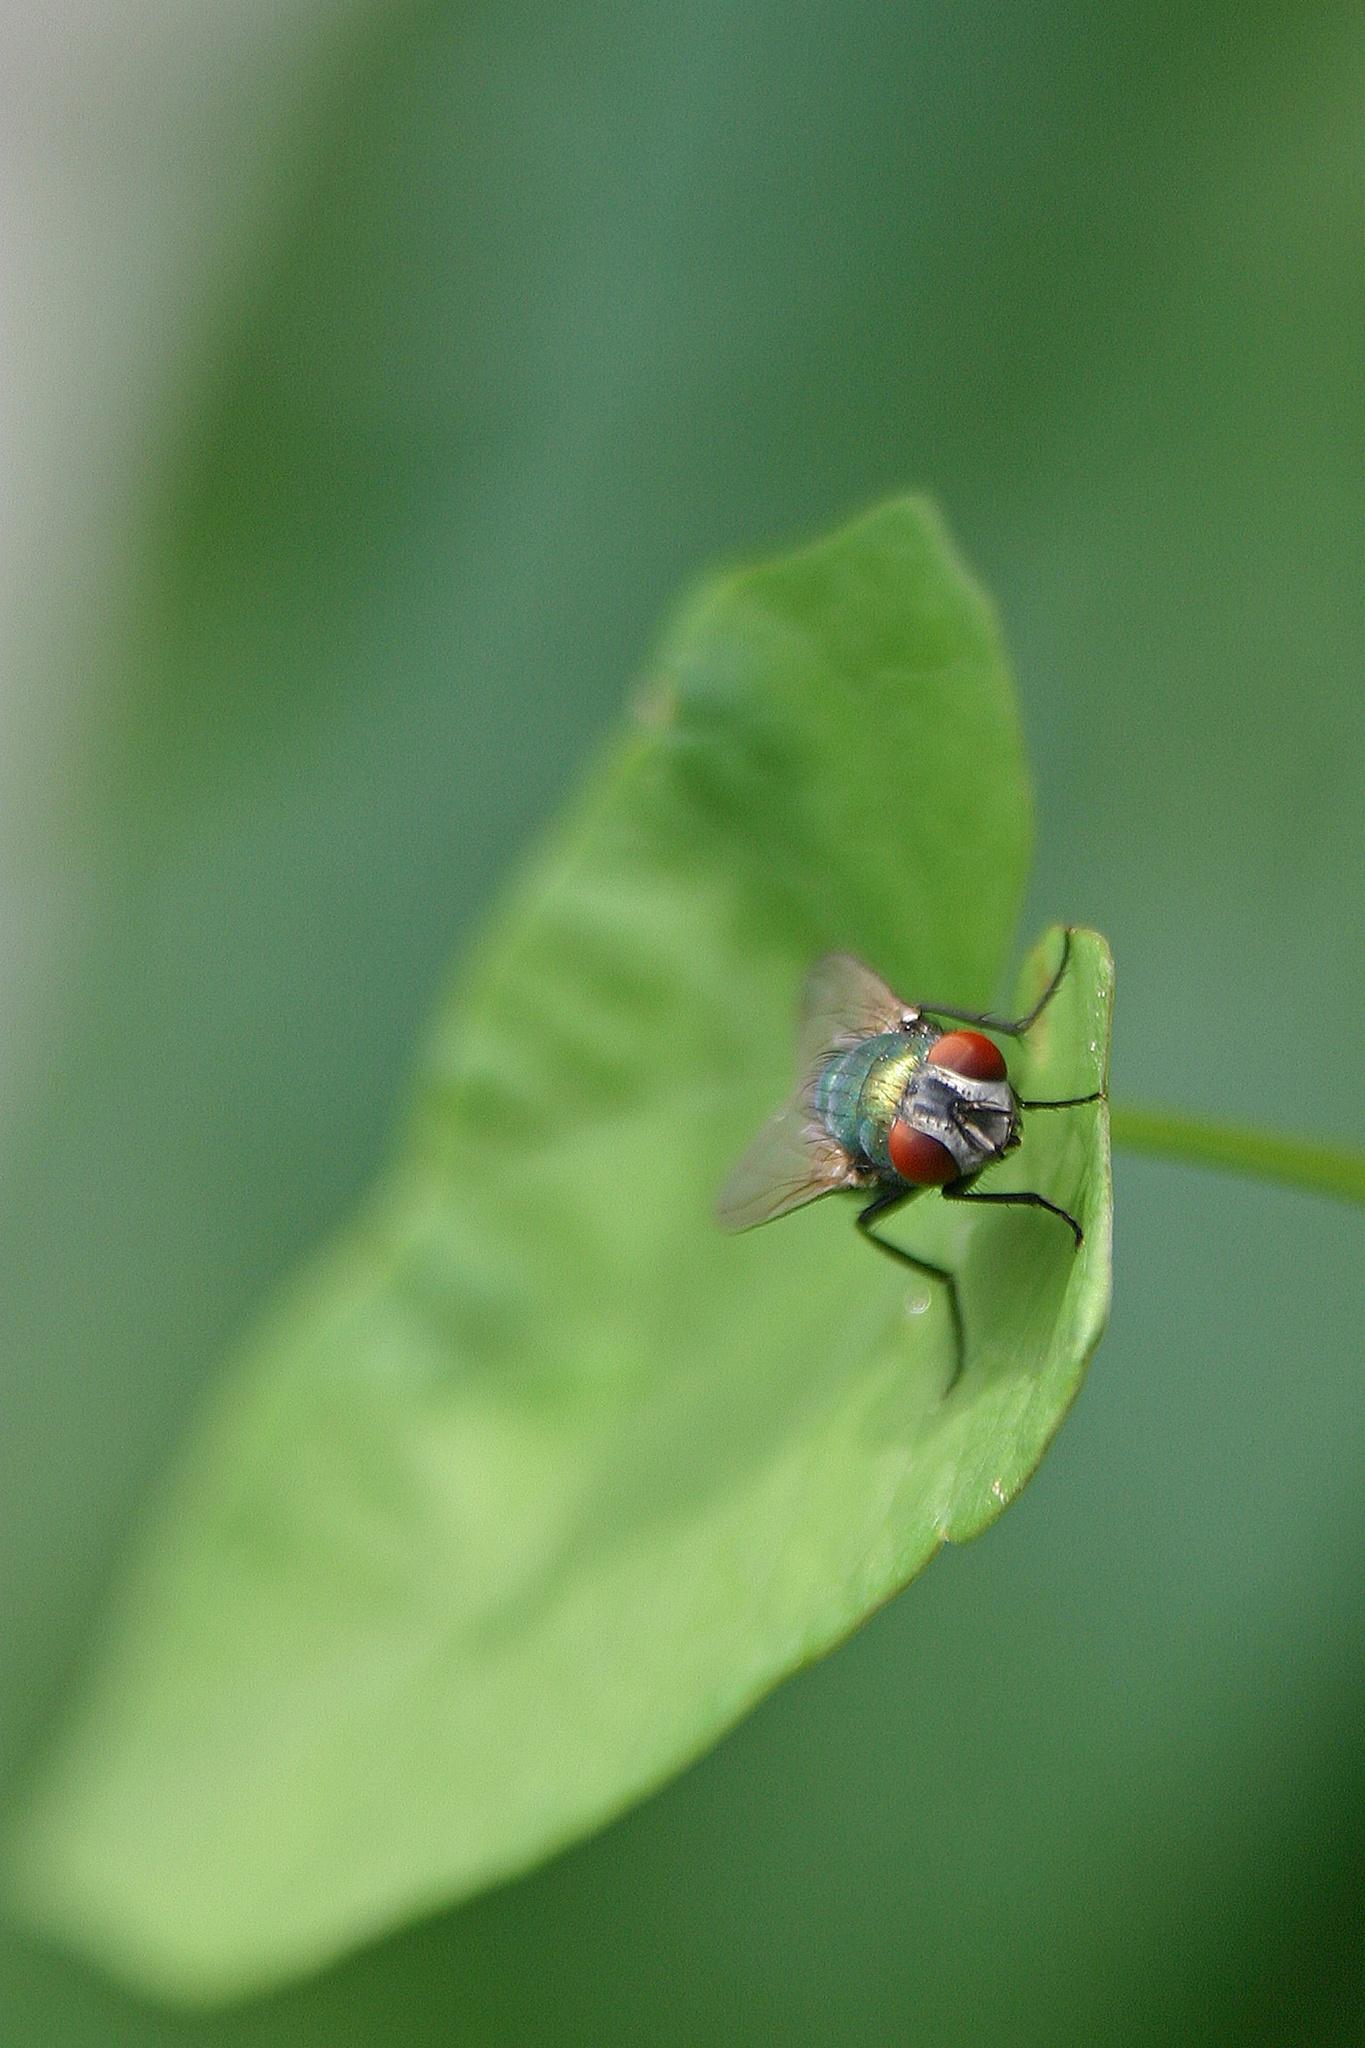 Green Fly by ejdelamora